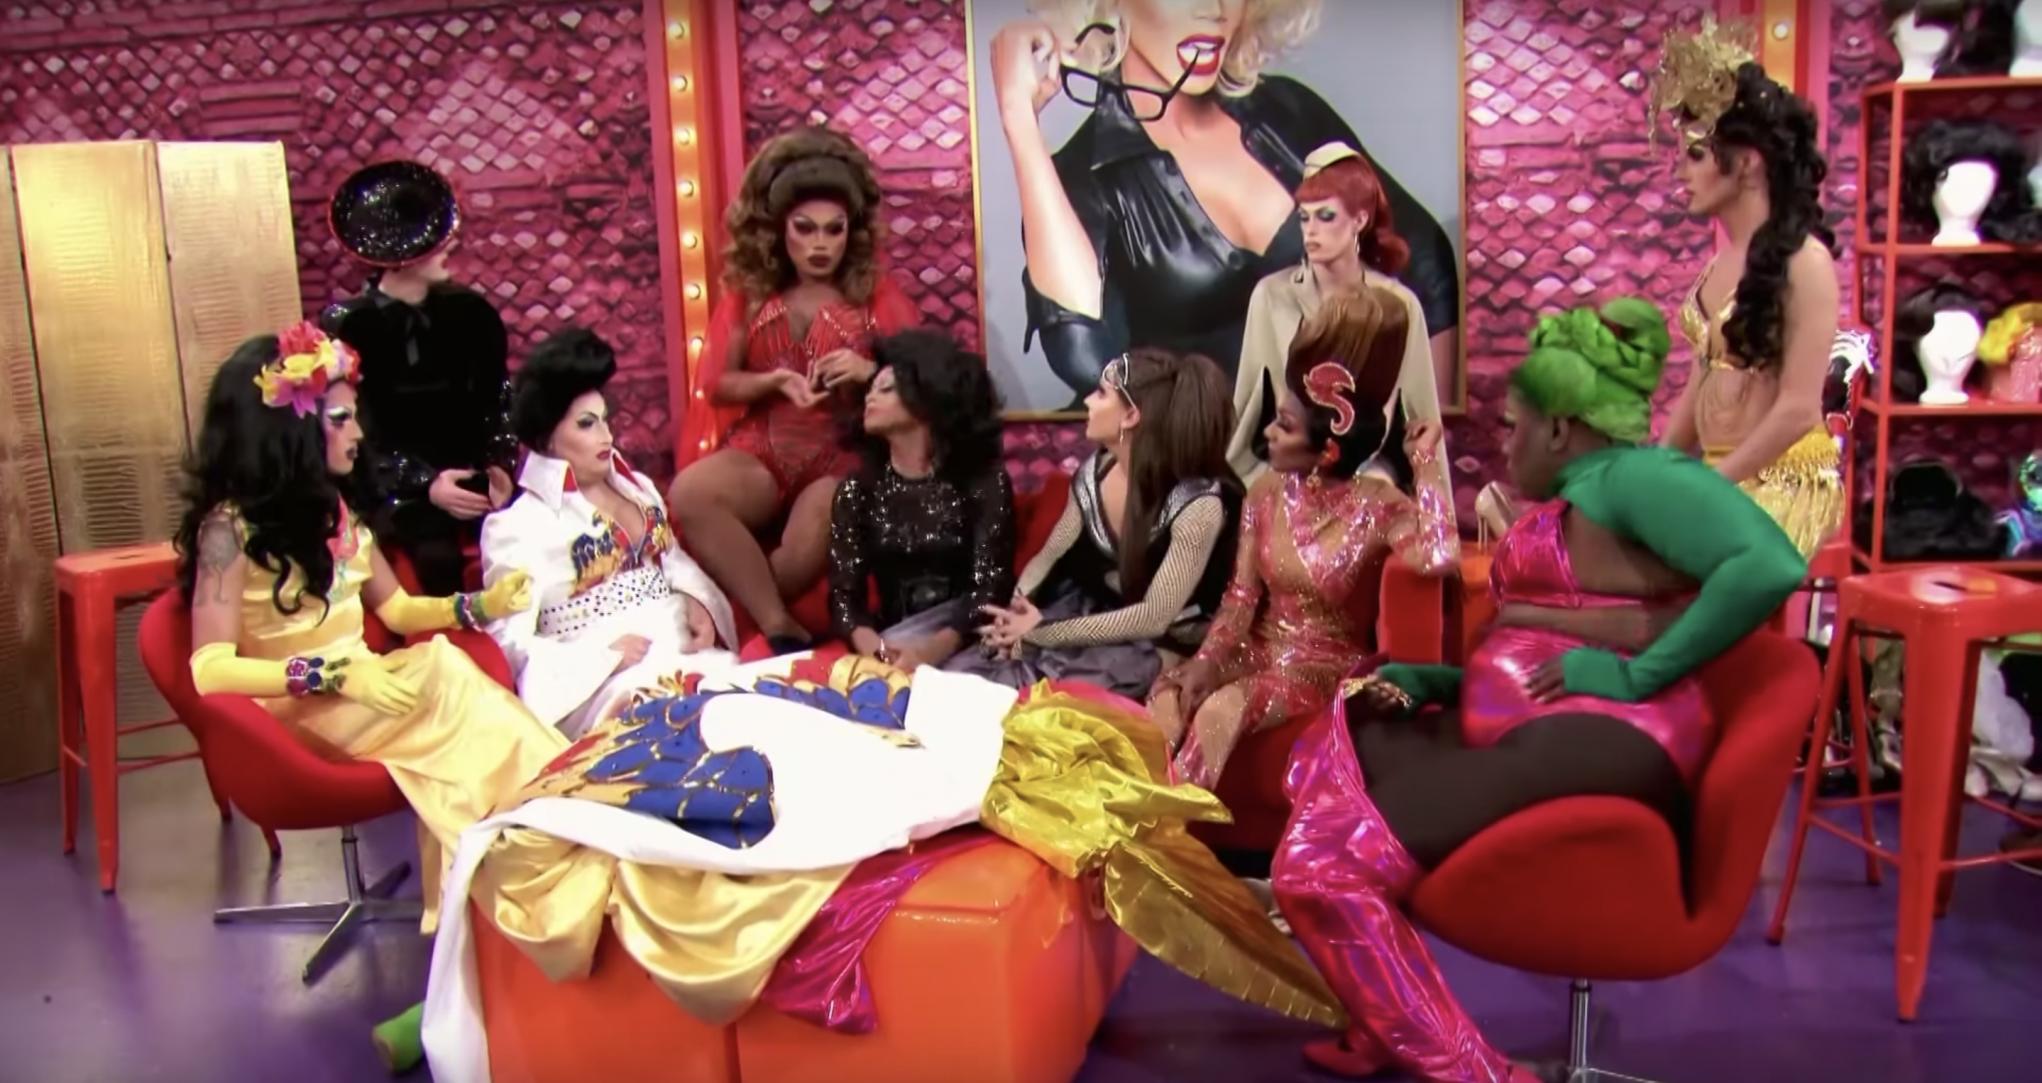 RuPaul's Drag Race Season 12 Episode 6